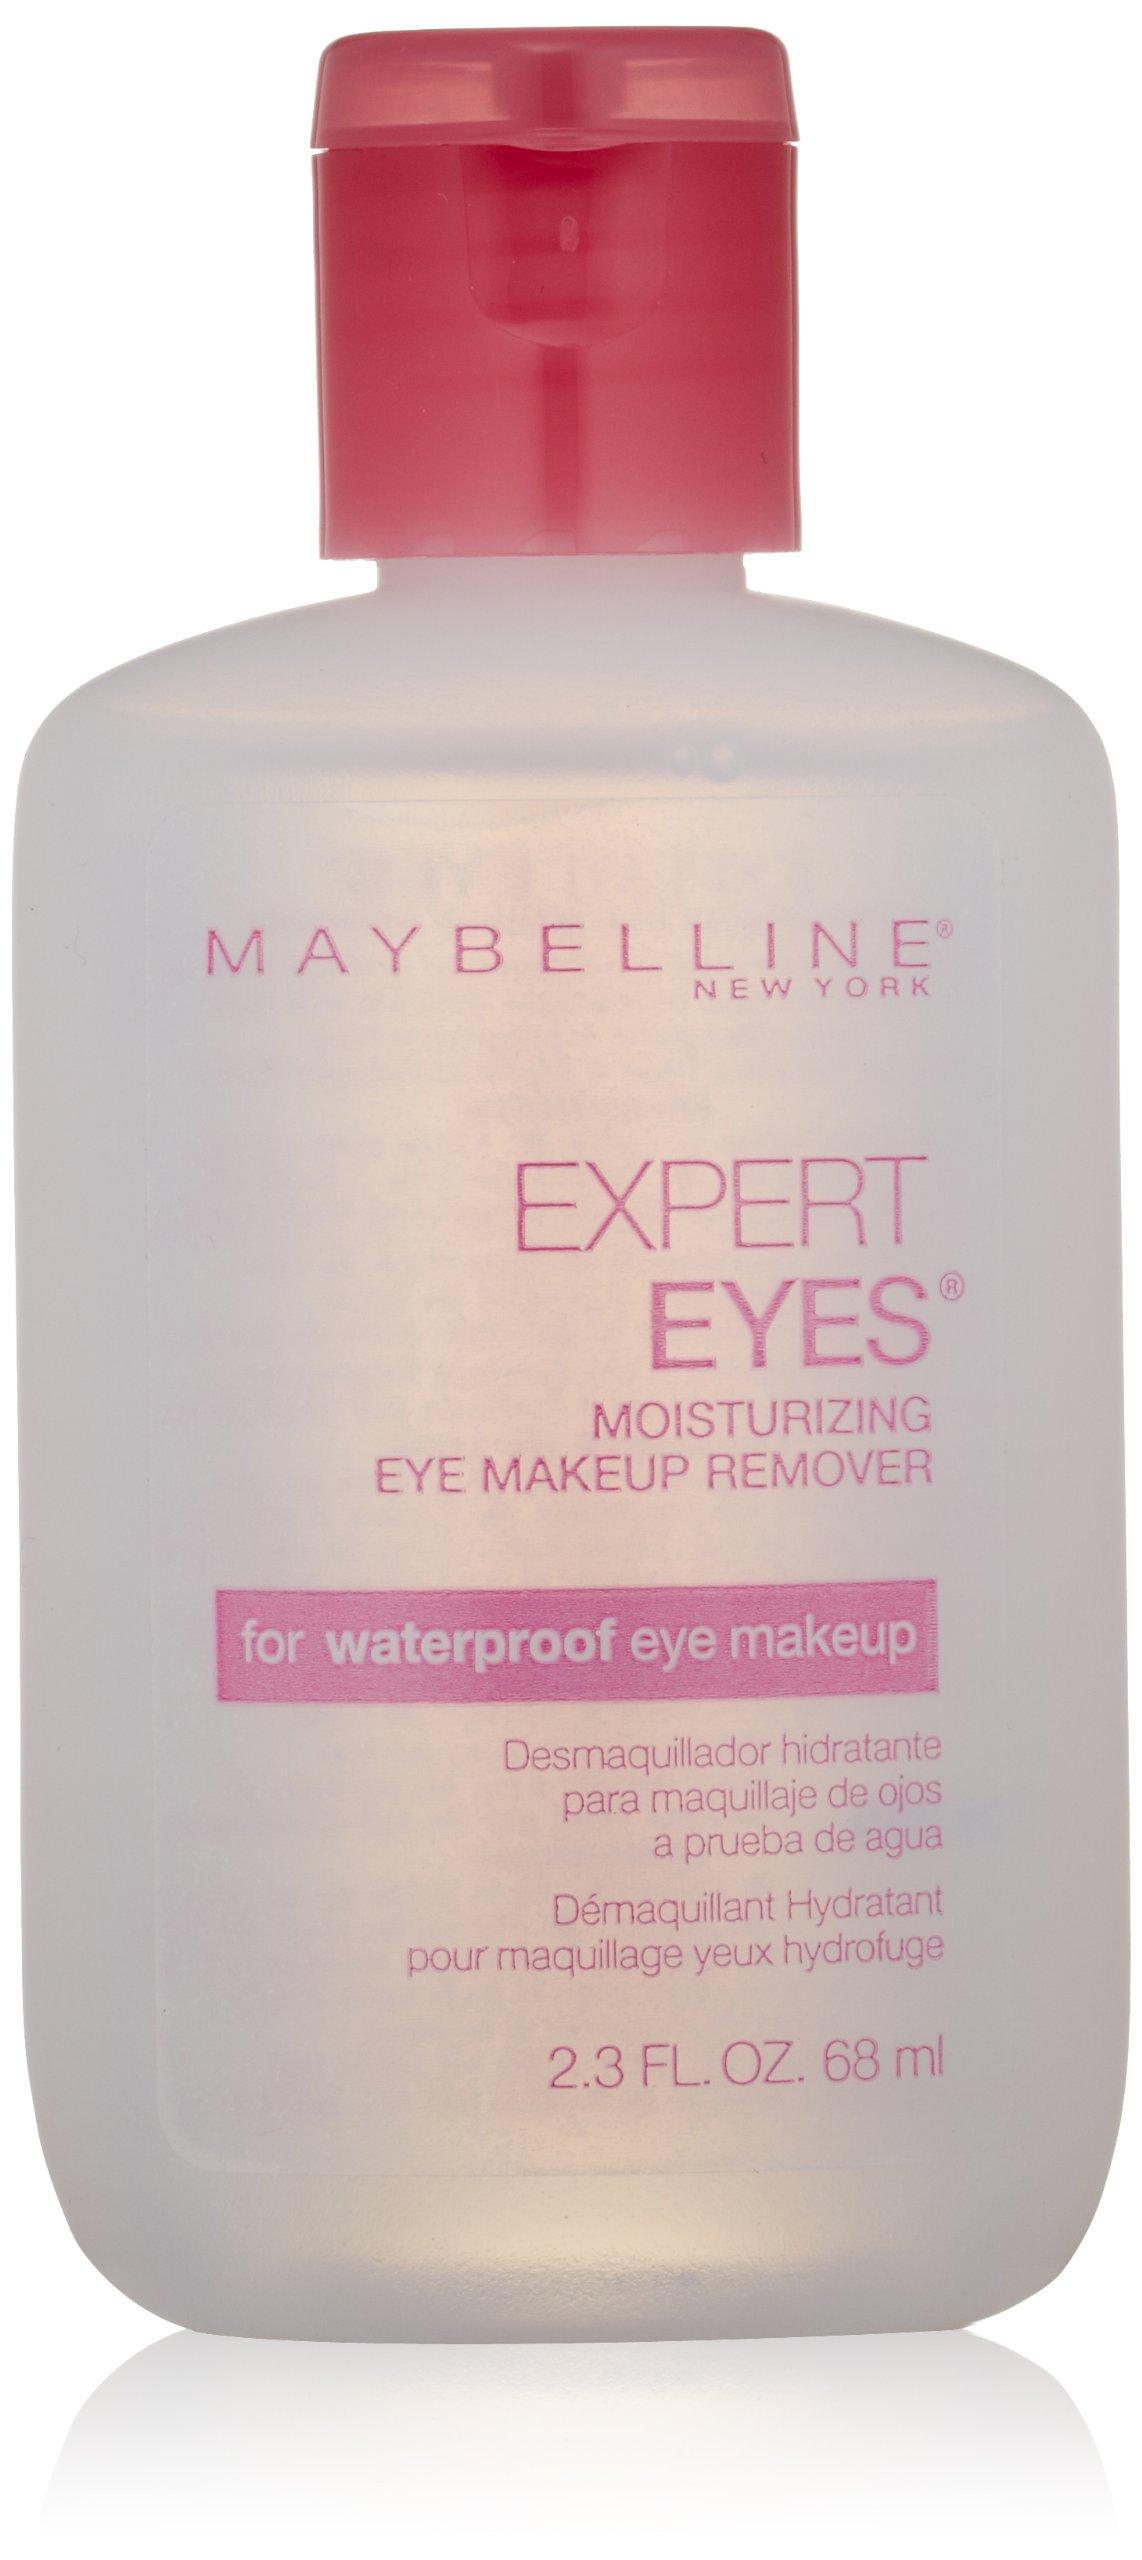 Maybelline Expert Eyes Moisturizing Eye Makeup Remover, For Waterproof Eye Makeup, 2.3 fl. oz.